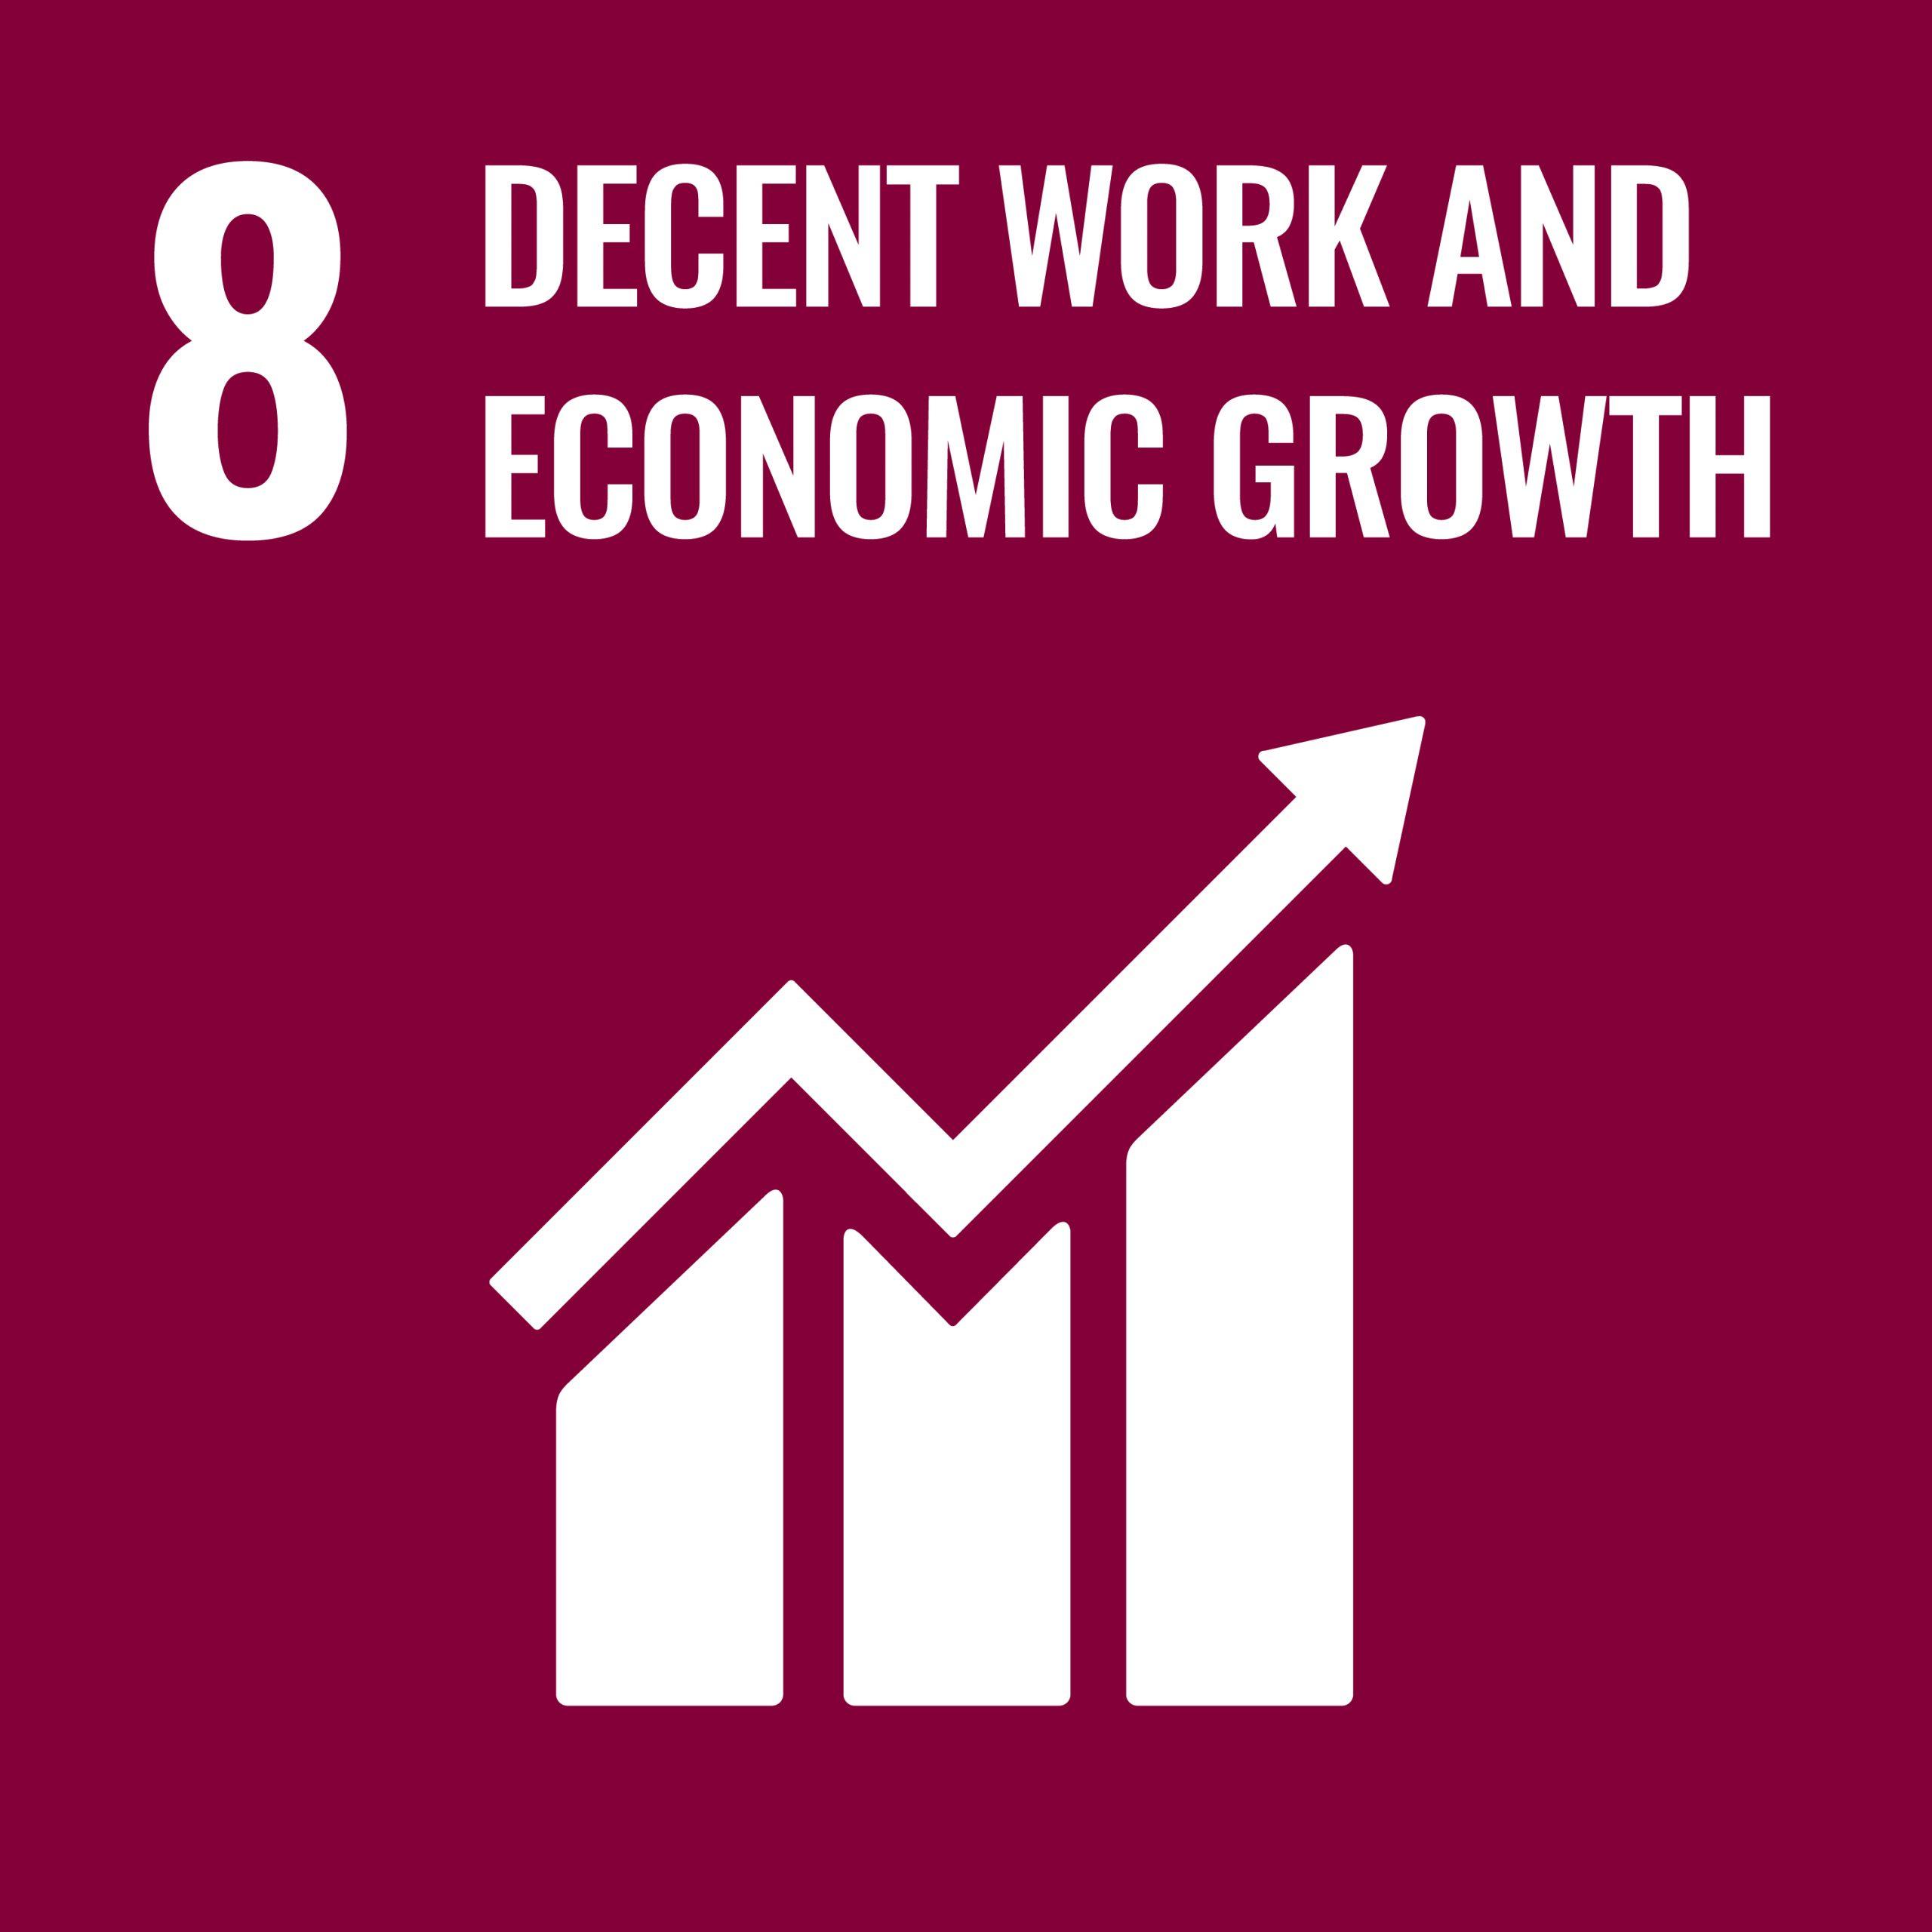 Decent work and economic growth - SDG 8